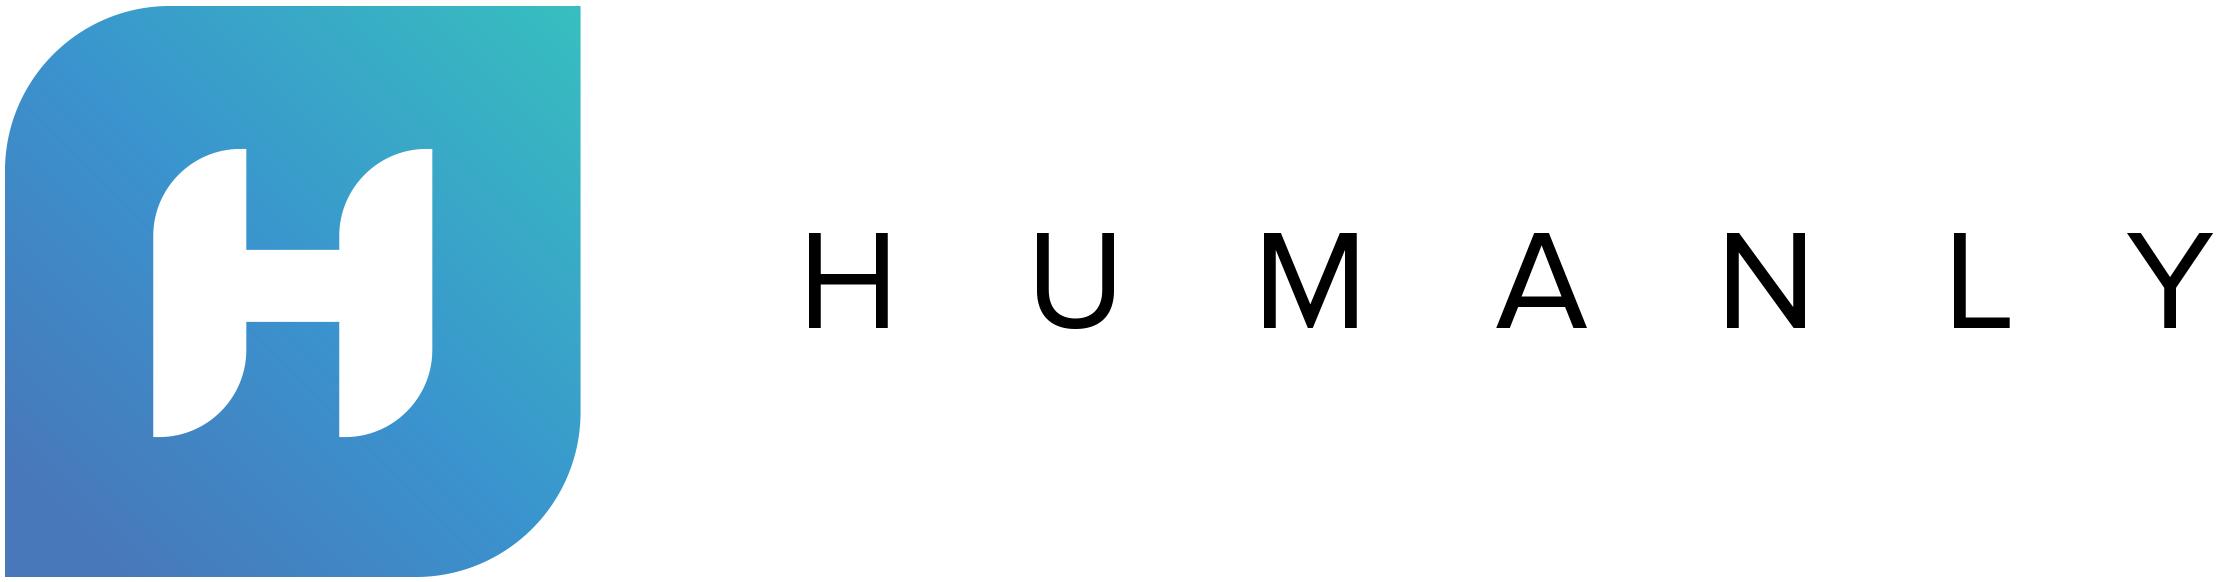 Sacramento HR Tech Startups Partner to Help Accelerate